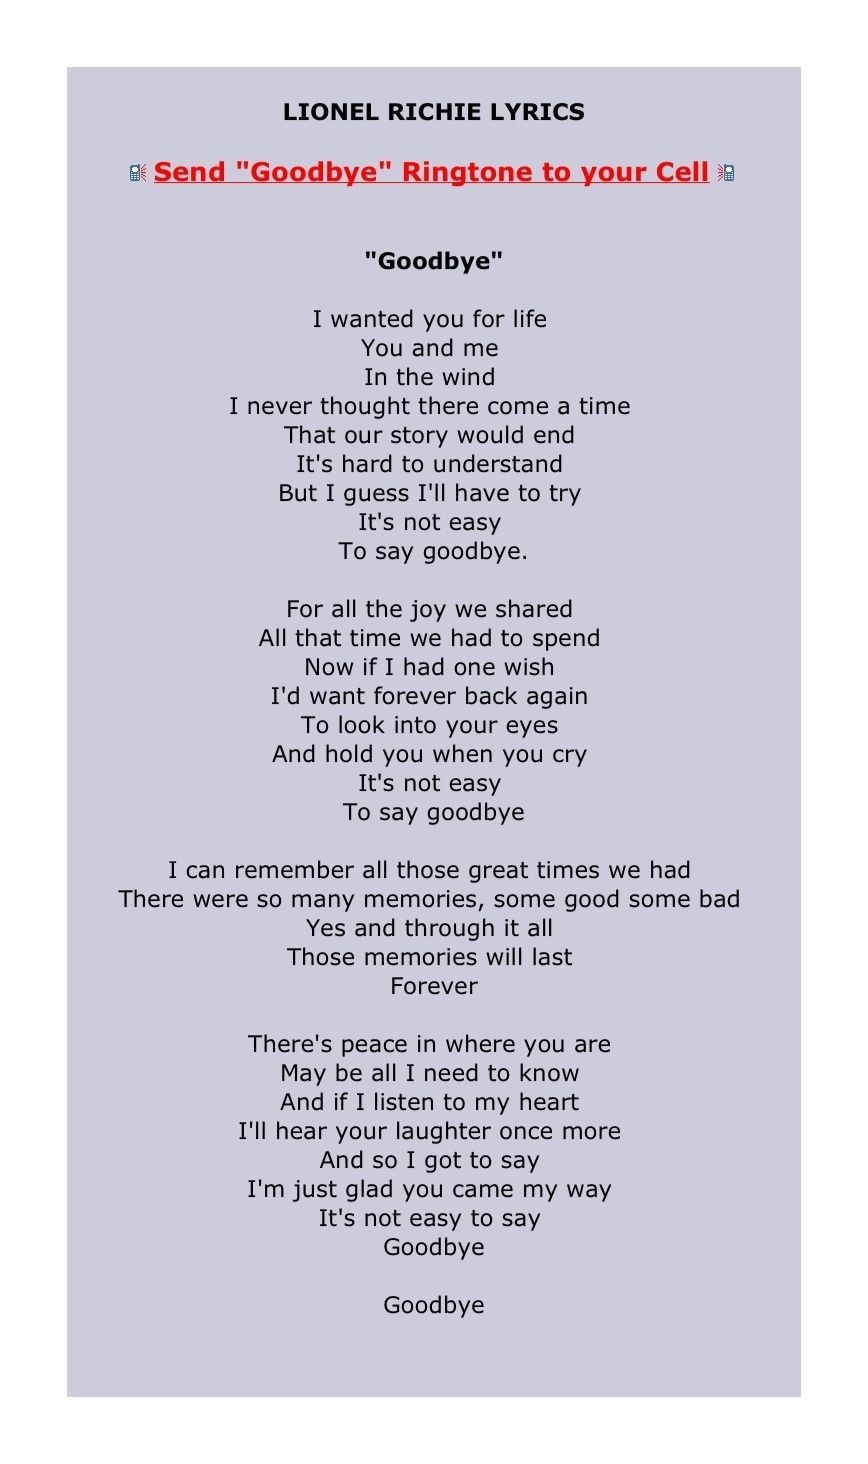 Big Mama Song Lyrics : lyrics, Goodbye, Lionel, Richie, Would, Missing, Lyrics,, Friend, Birthday, Quotes,, Lyrics